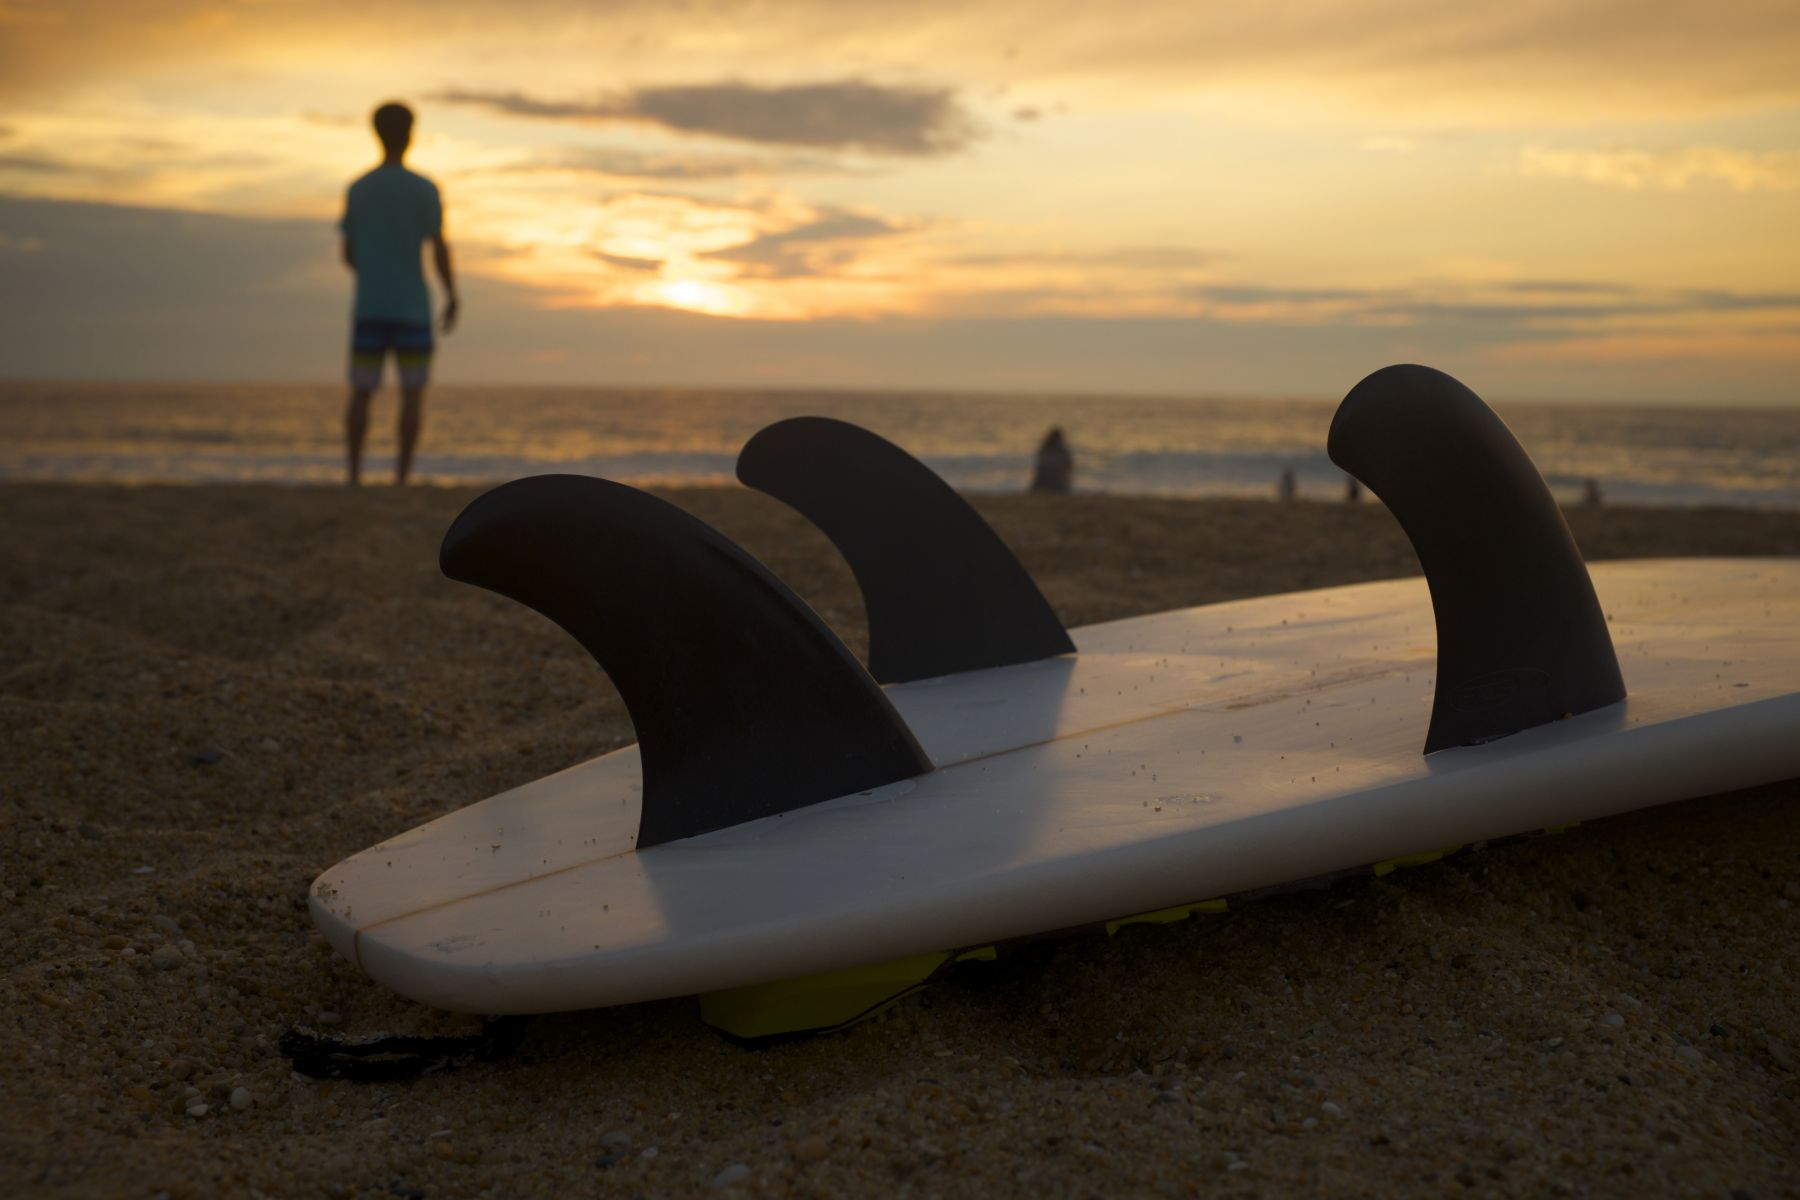 surboard-on-beach